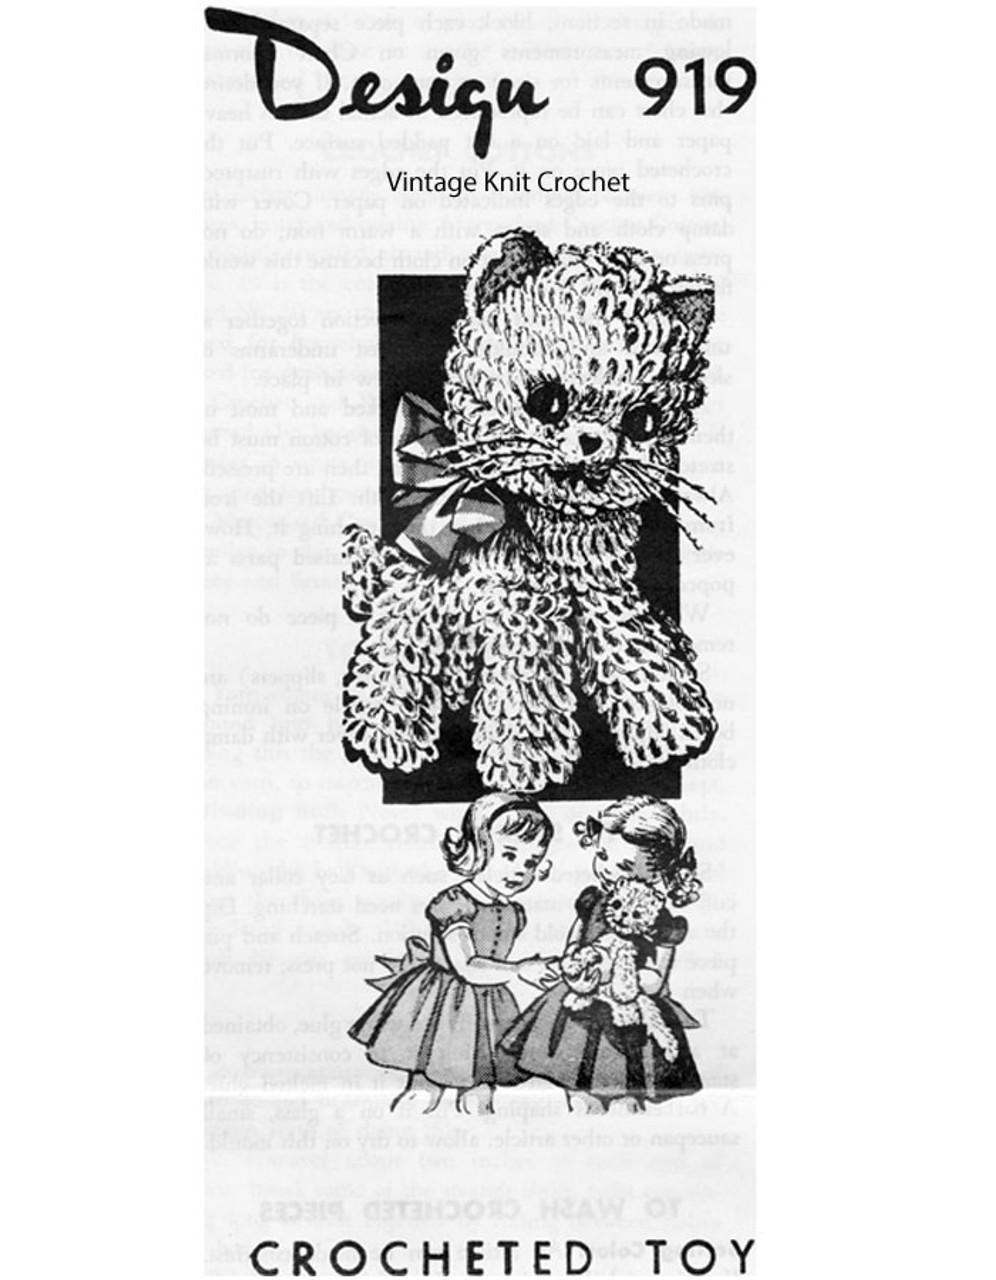 Crochet Stuffed Animal Pattern, Kitten, Mail Order Design 919